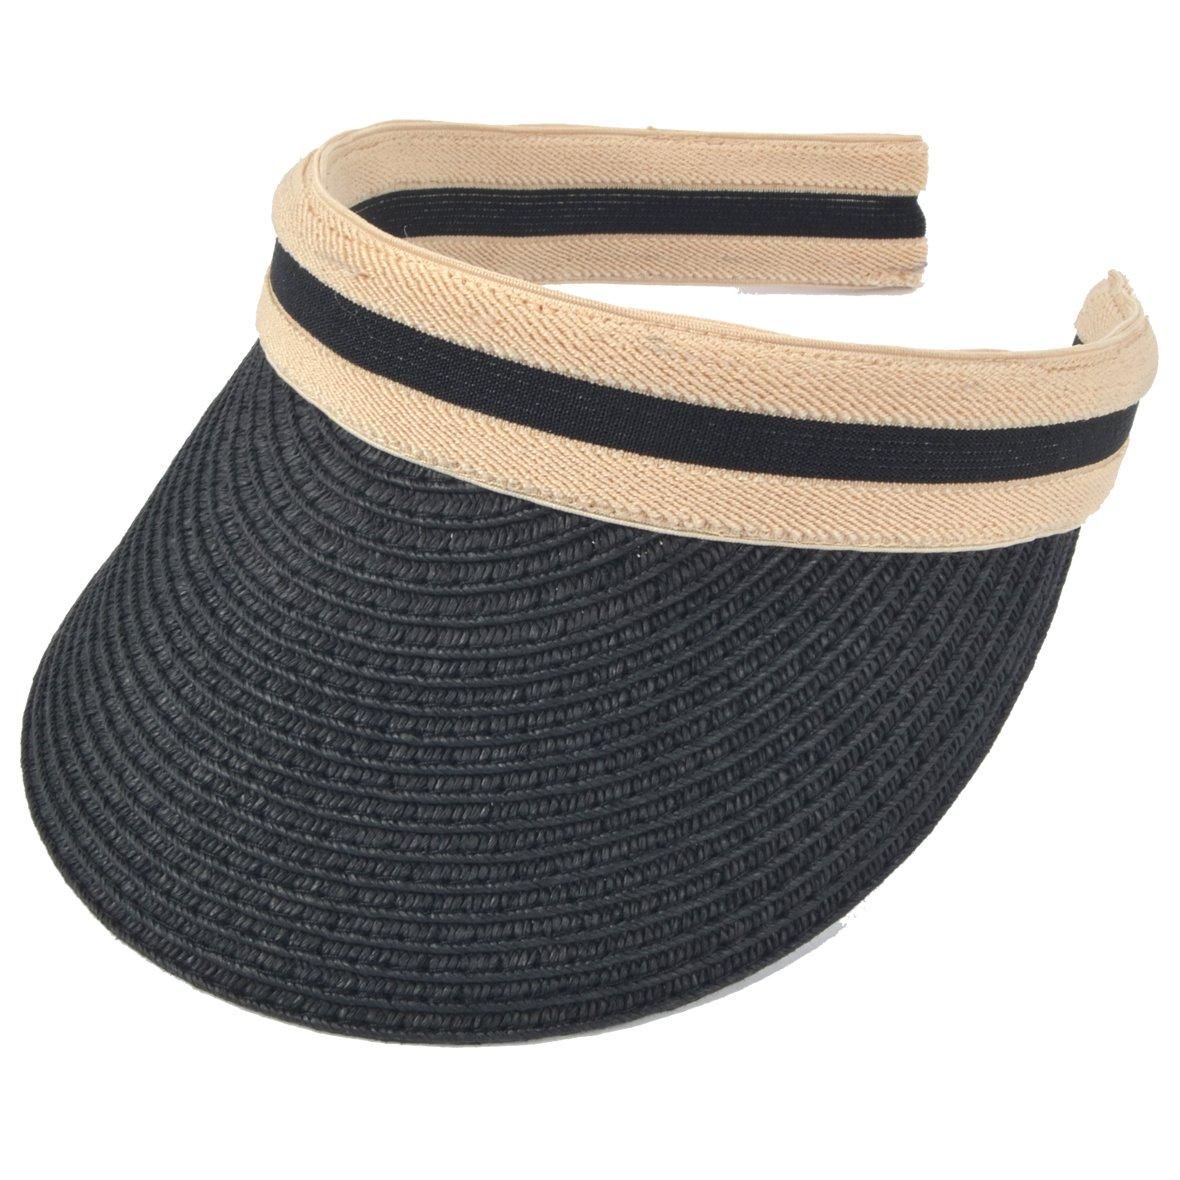 Women Sun Straw Visor Hat UV Protection Golf Beach Outdoor Sports Summer Hat V201 (Black)